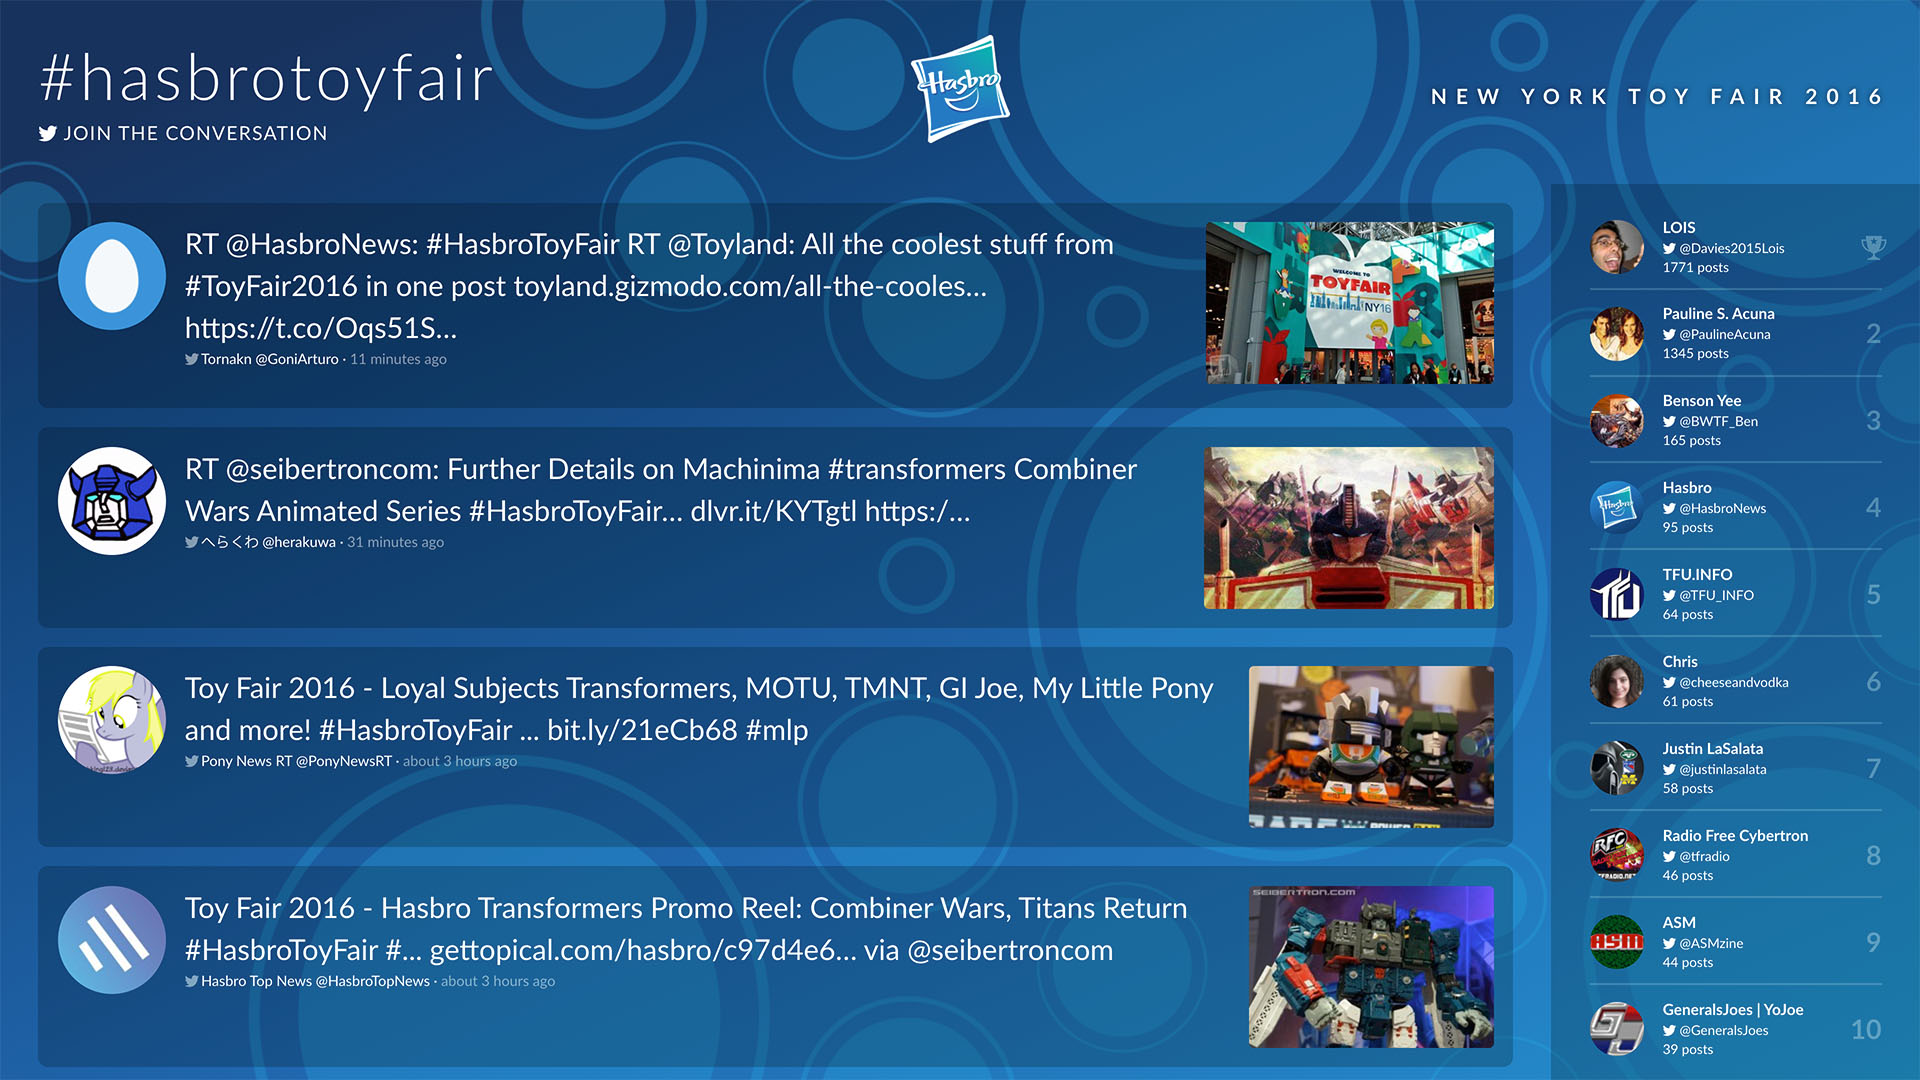 Hasbro Toy Fair 2016 Screenshot